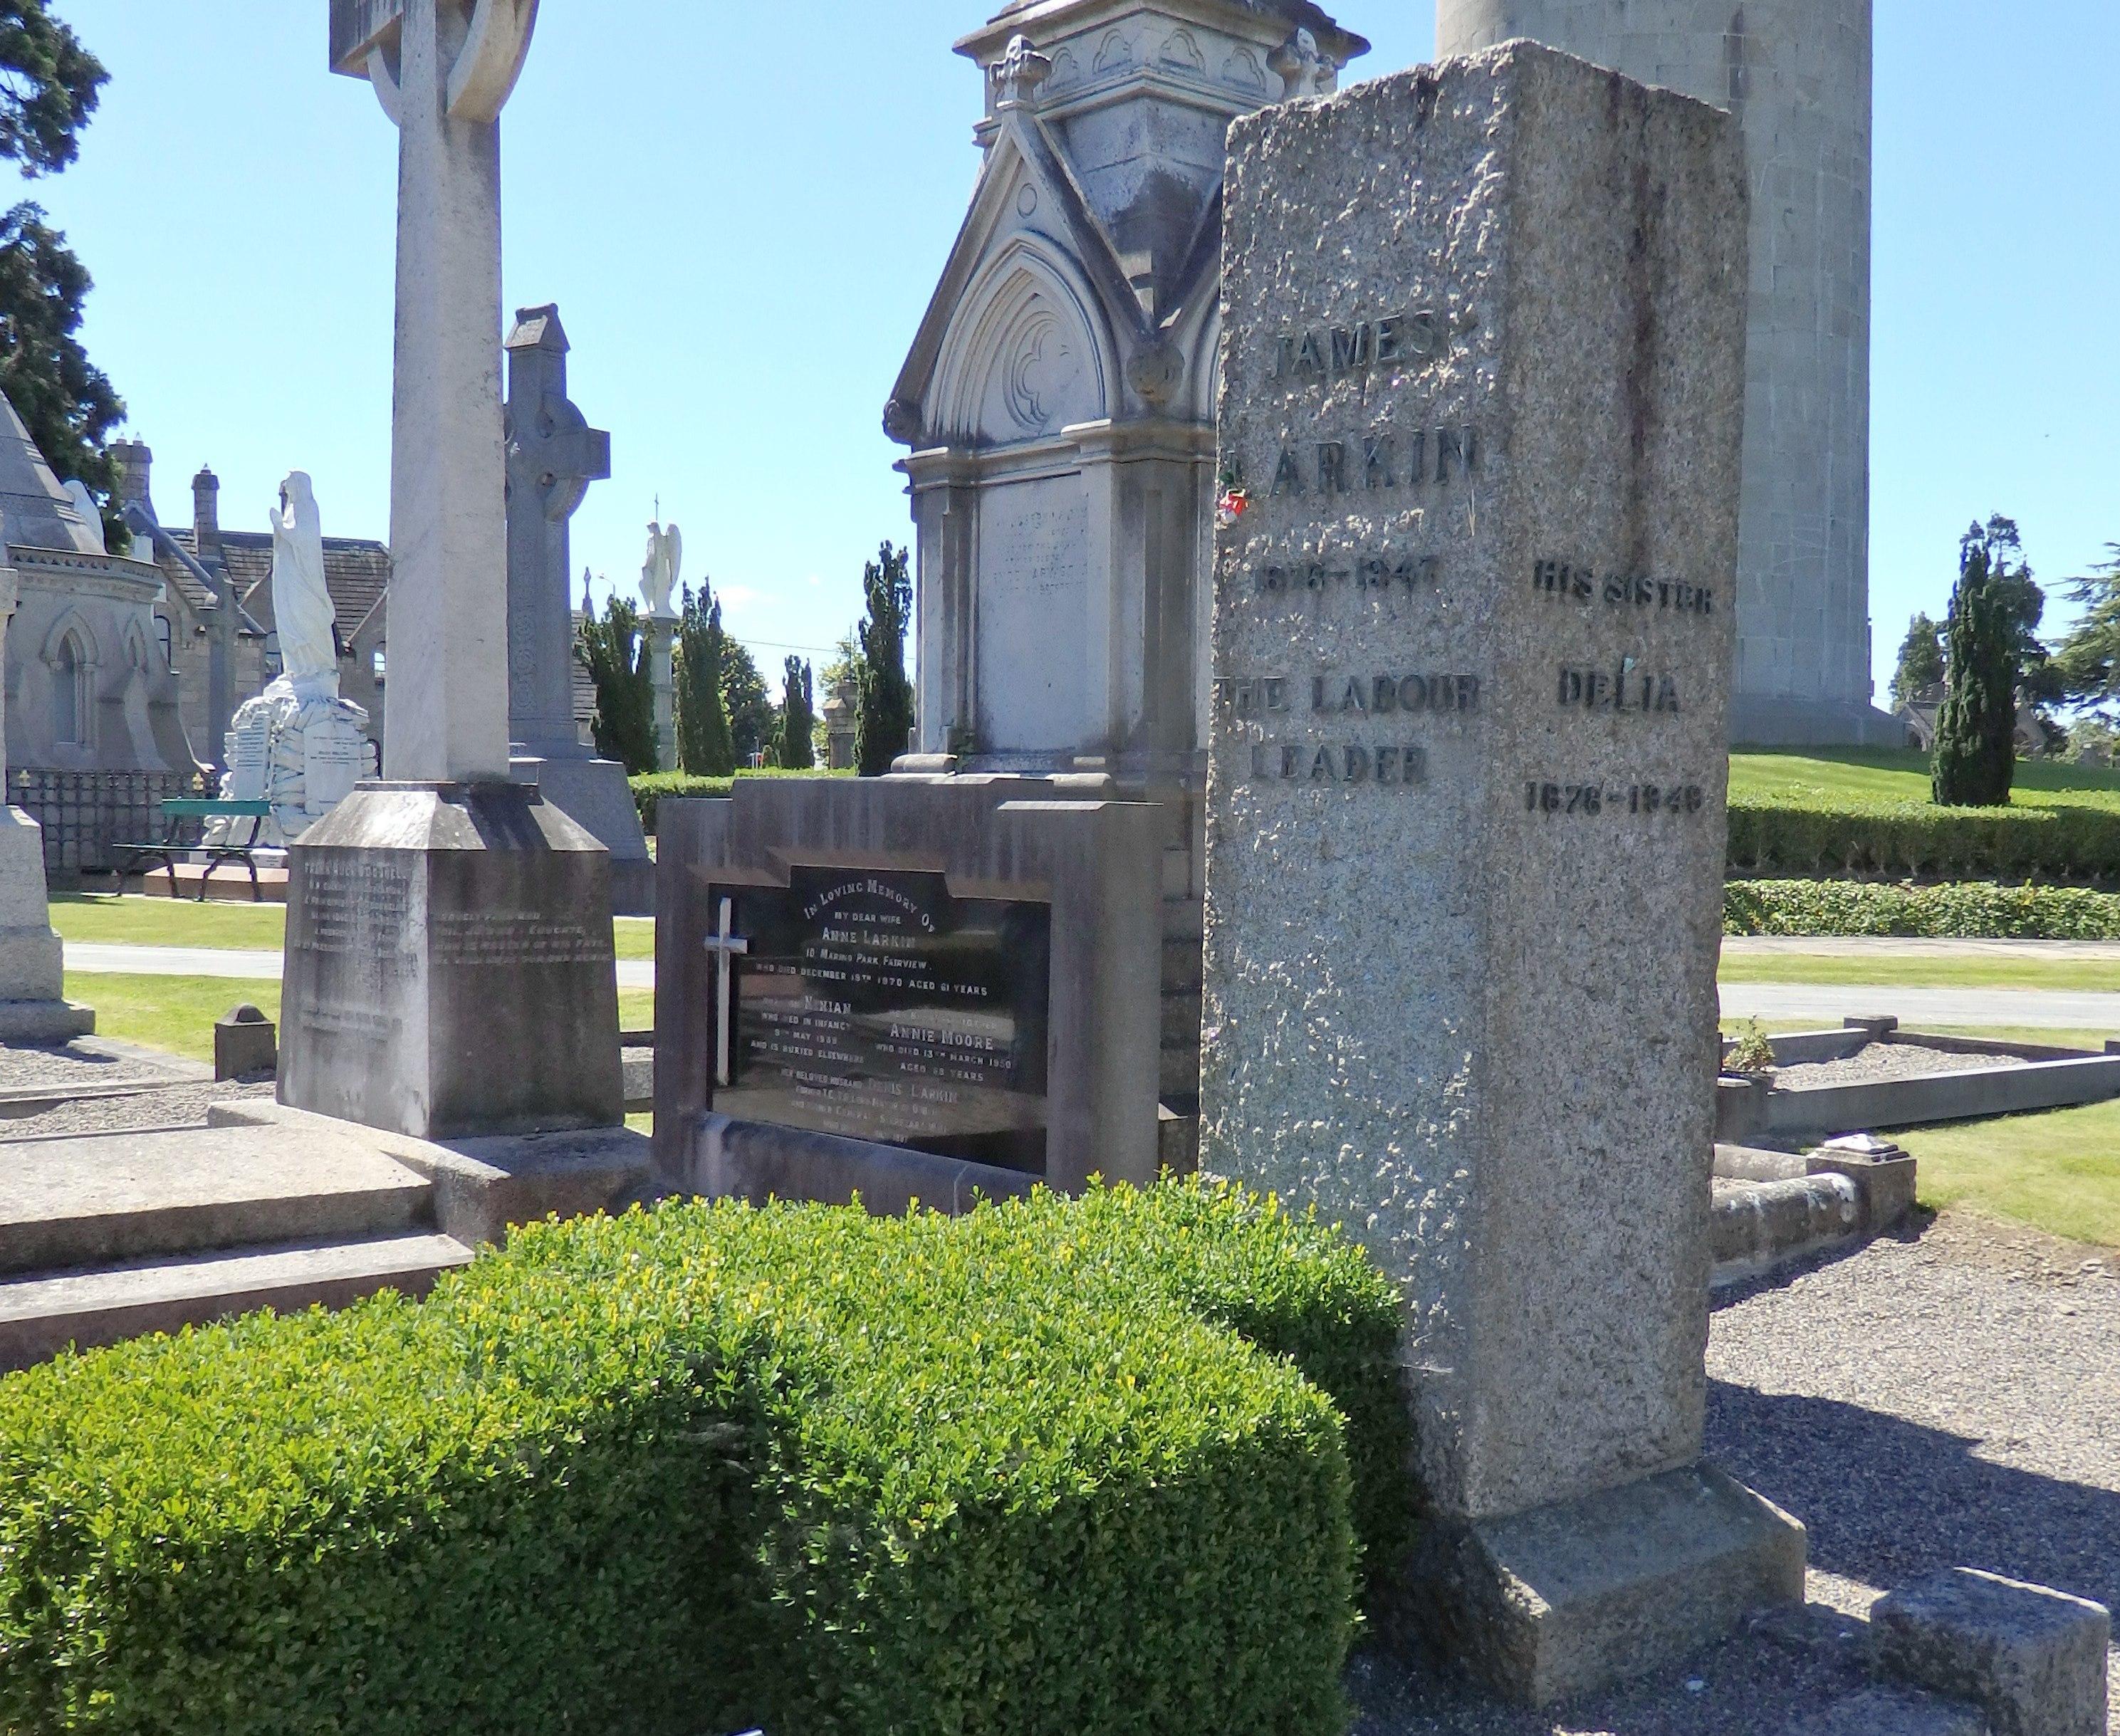 james-larkin-1876-1947